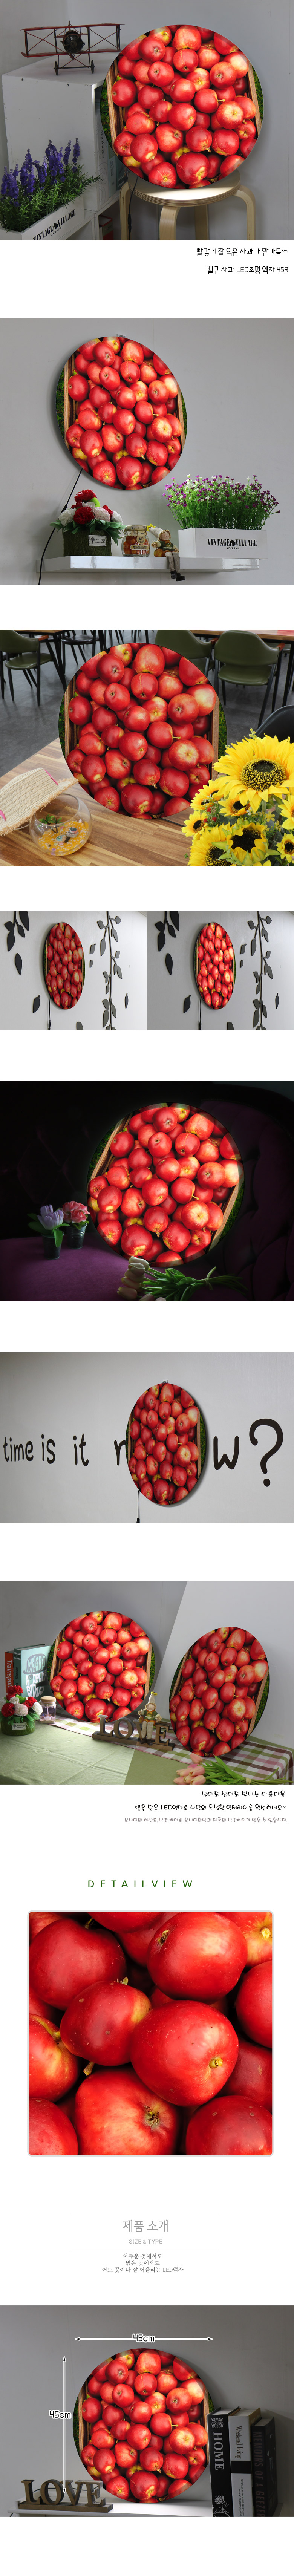 LED액자45R_빨간사과 - 꾸밈, 86,000원, 포인트조명, 터치조명